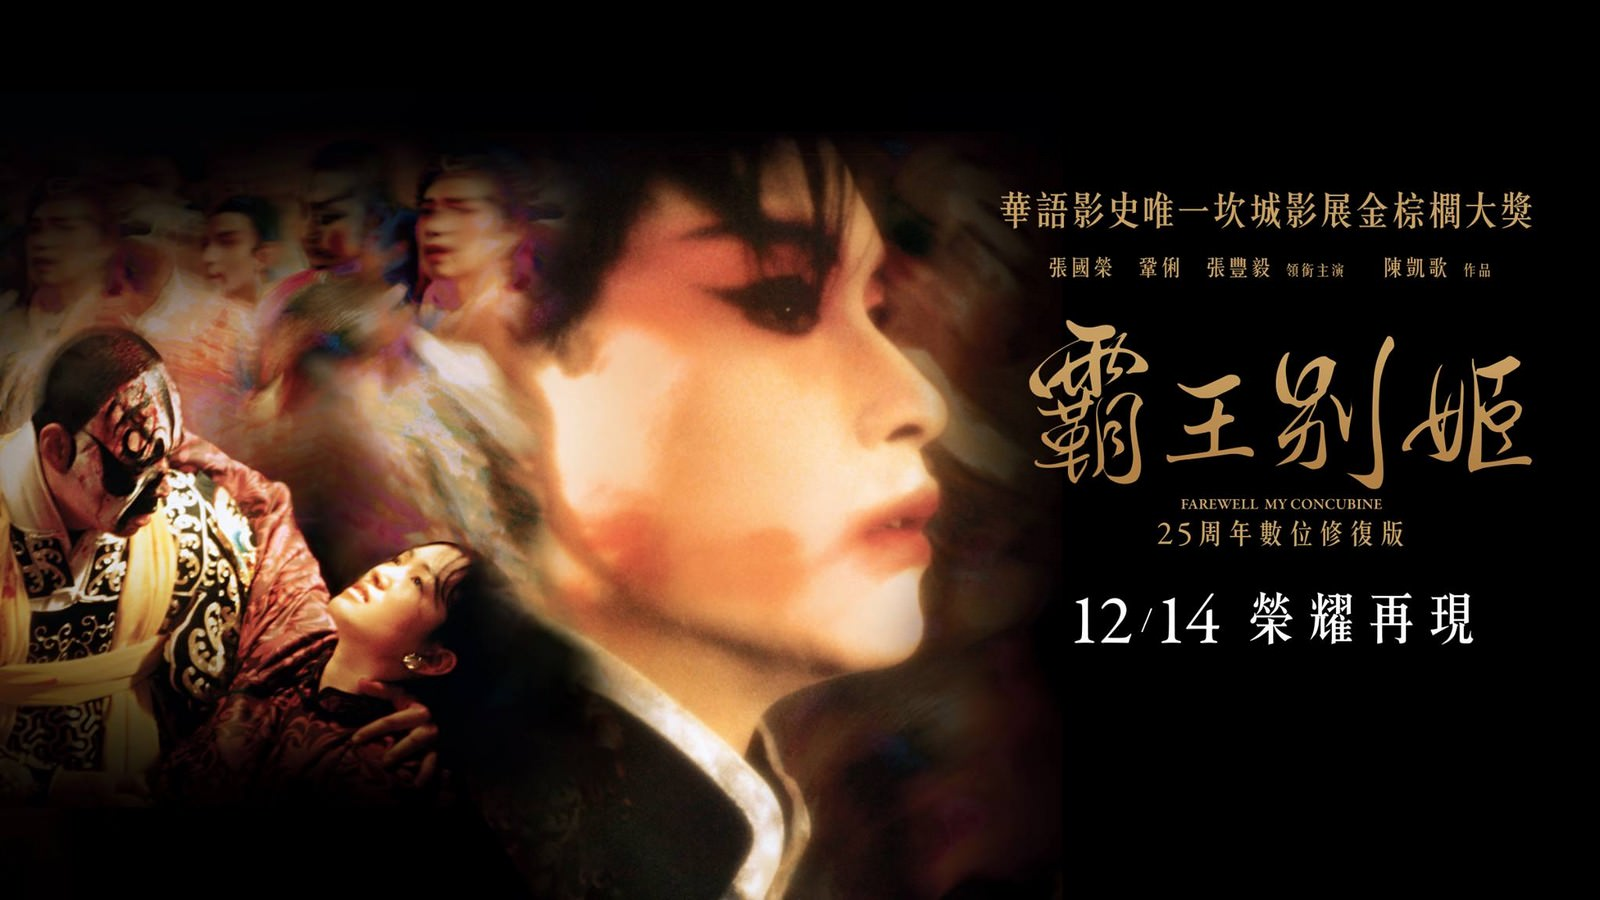 Movie, 霸王别姬(中國, 1993年) / 霸王別姬(台灣) / Farewell My Concubine(英文), 電影海報, 台灣, 25周年數位修復版, 橫版